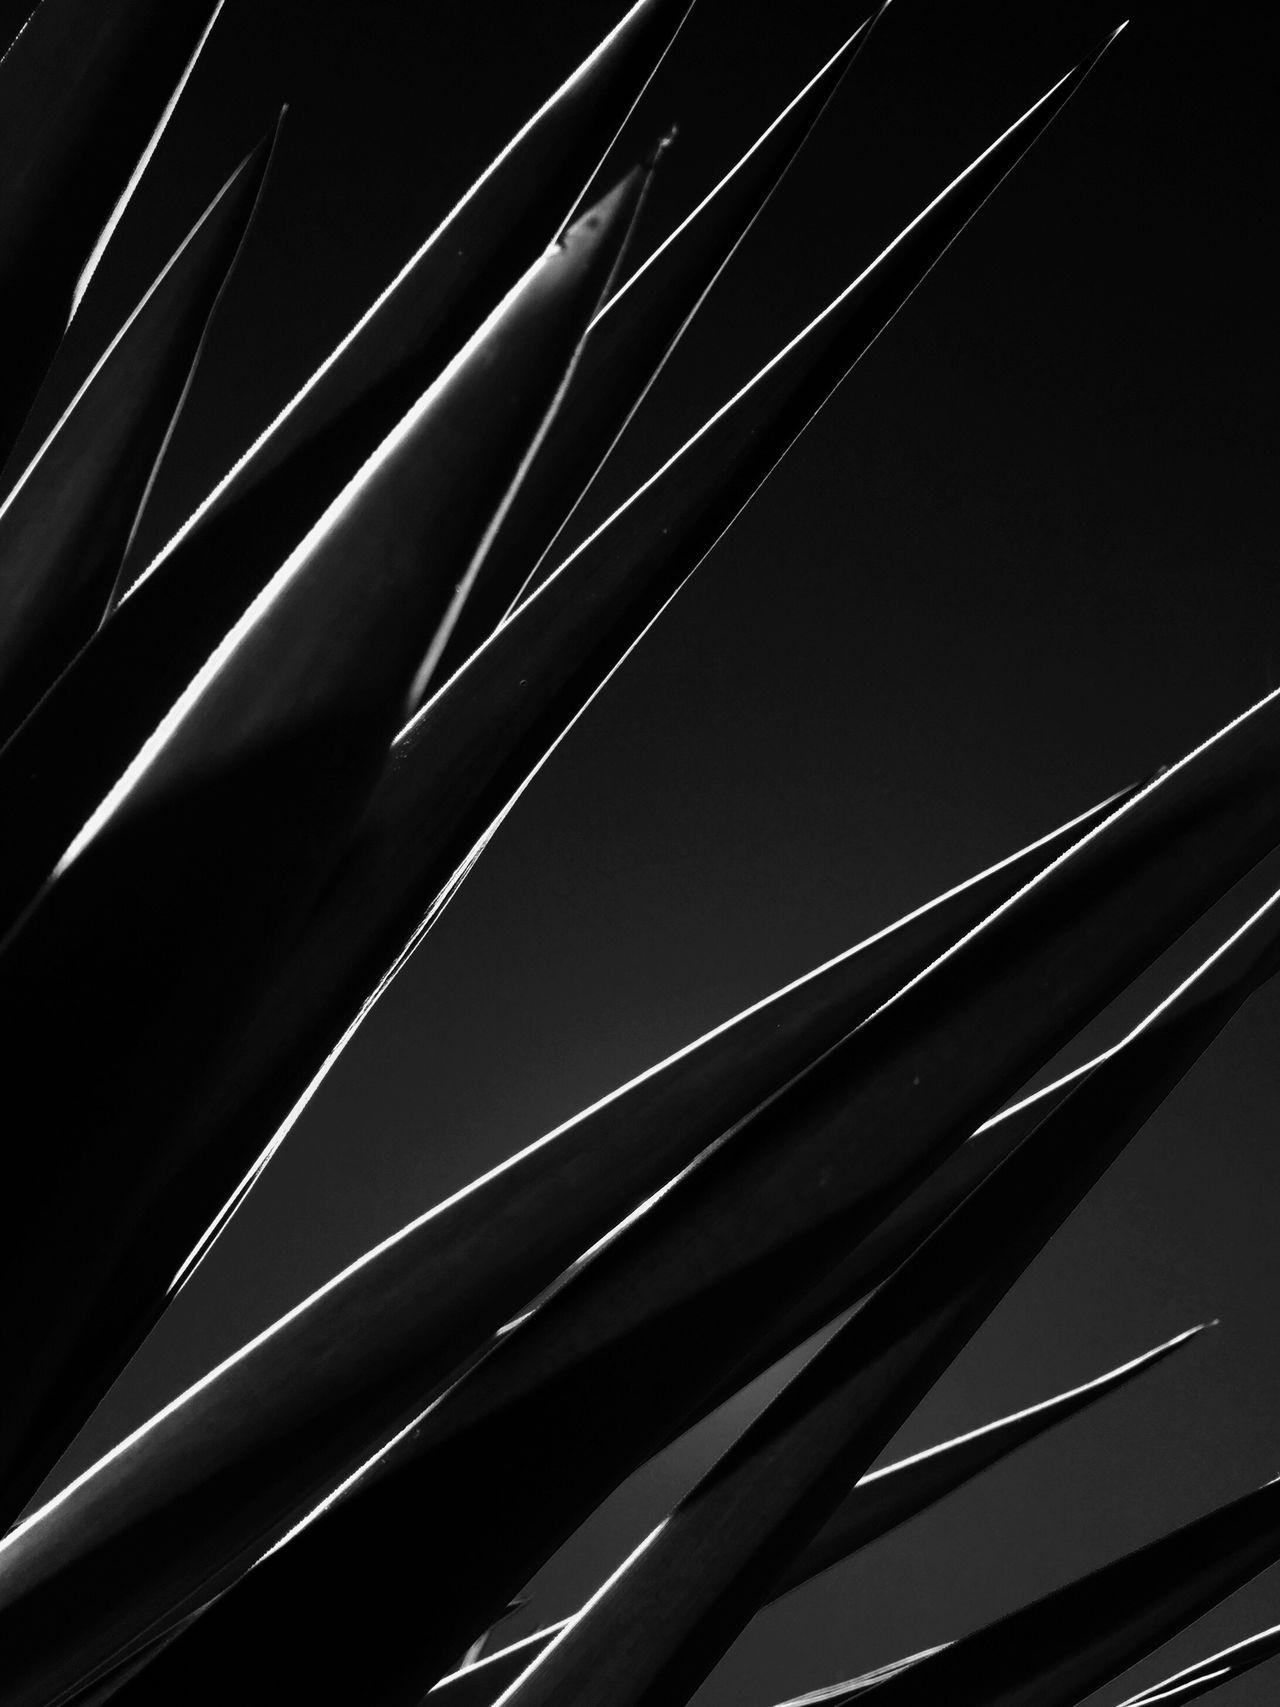 Monochrome Photography Pattern Sharp